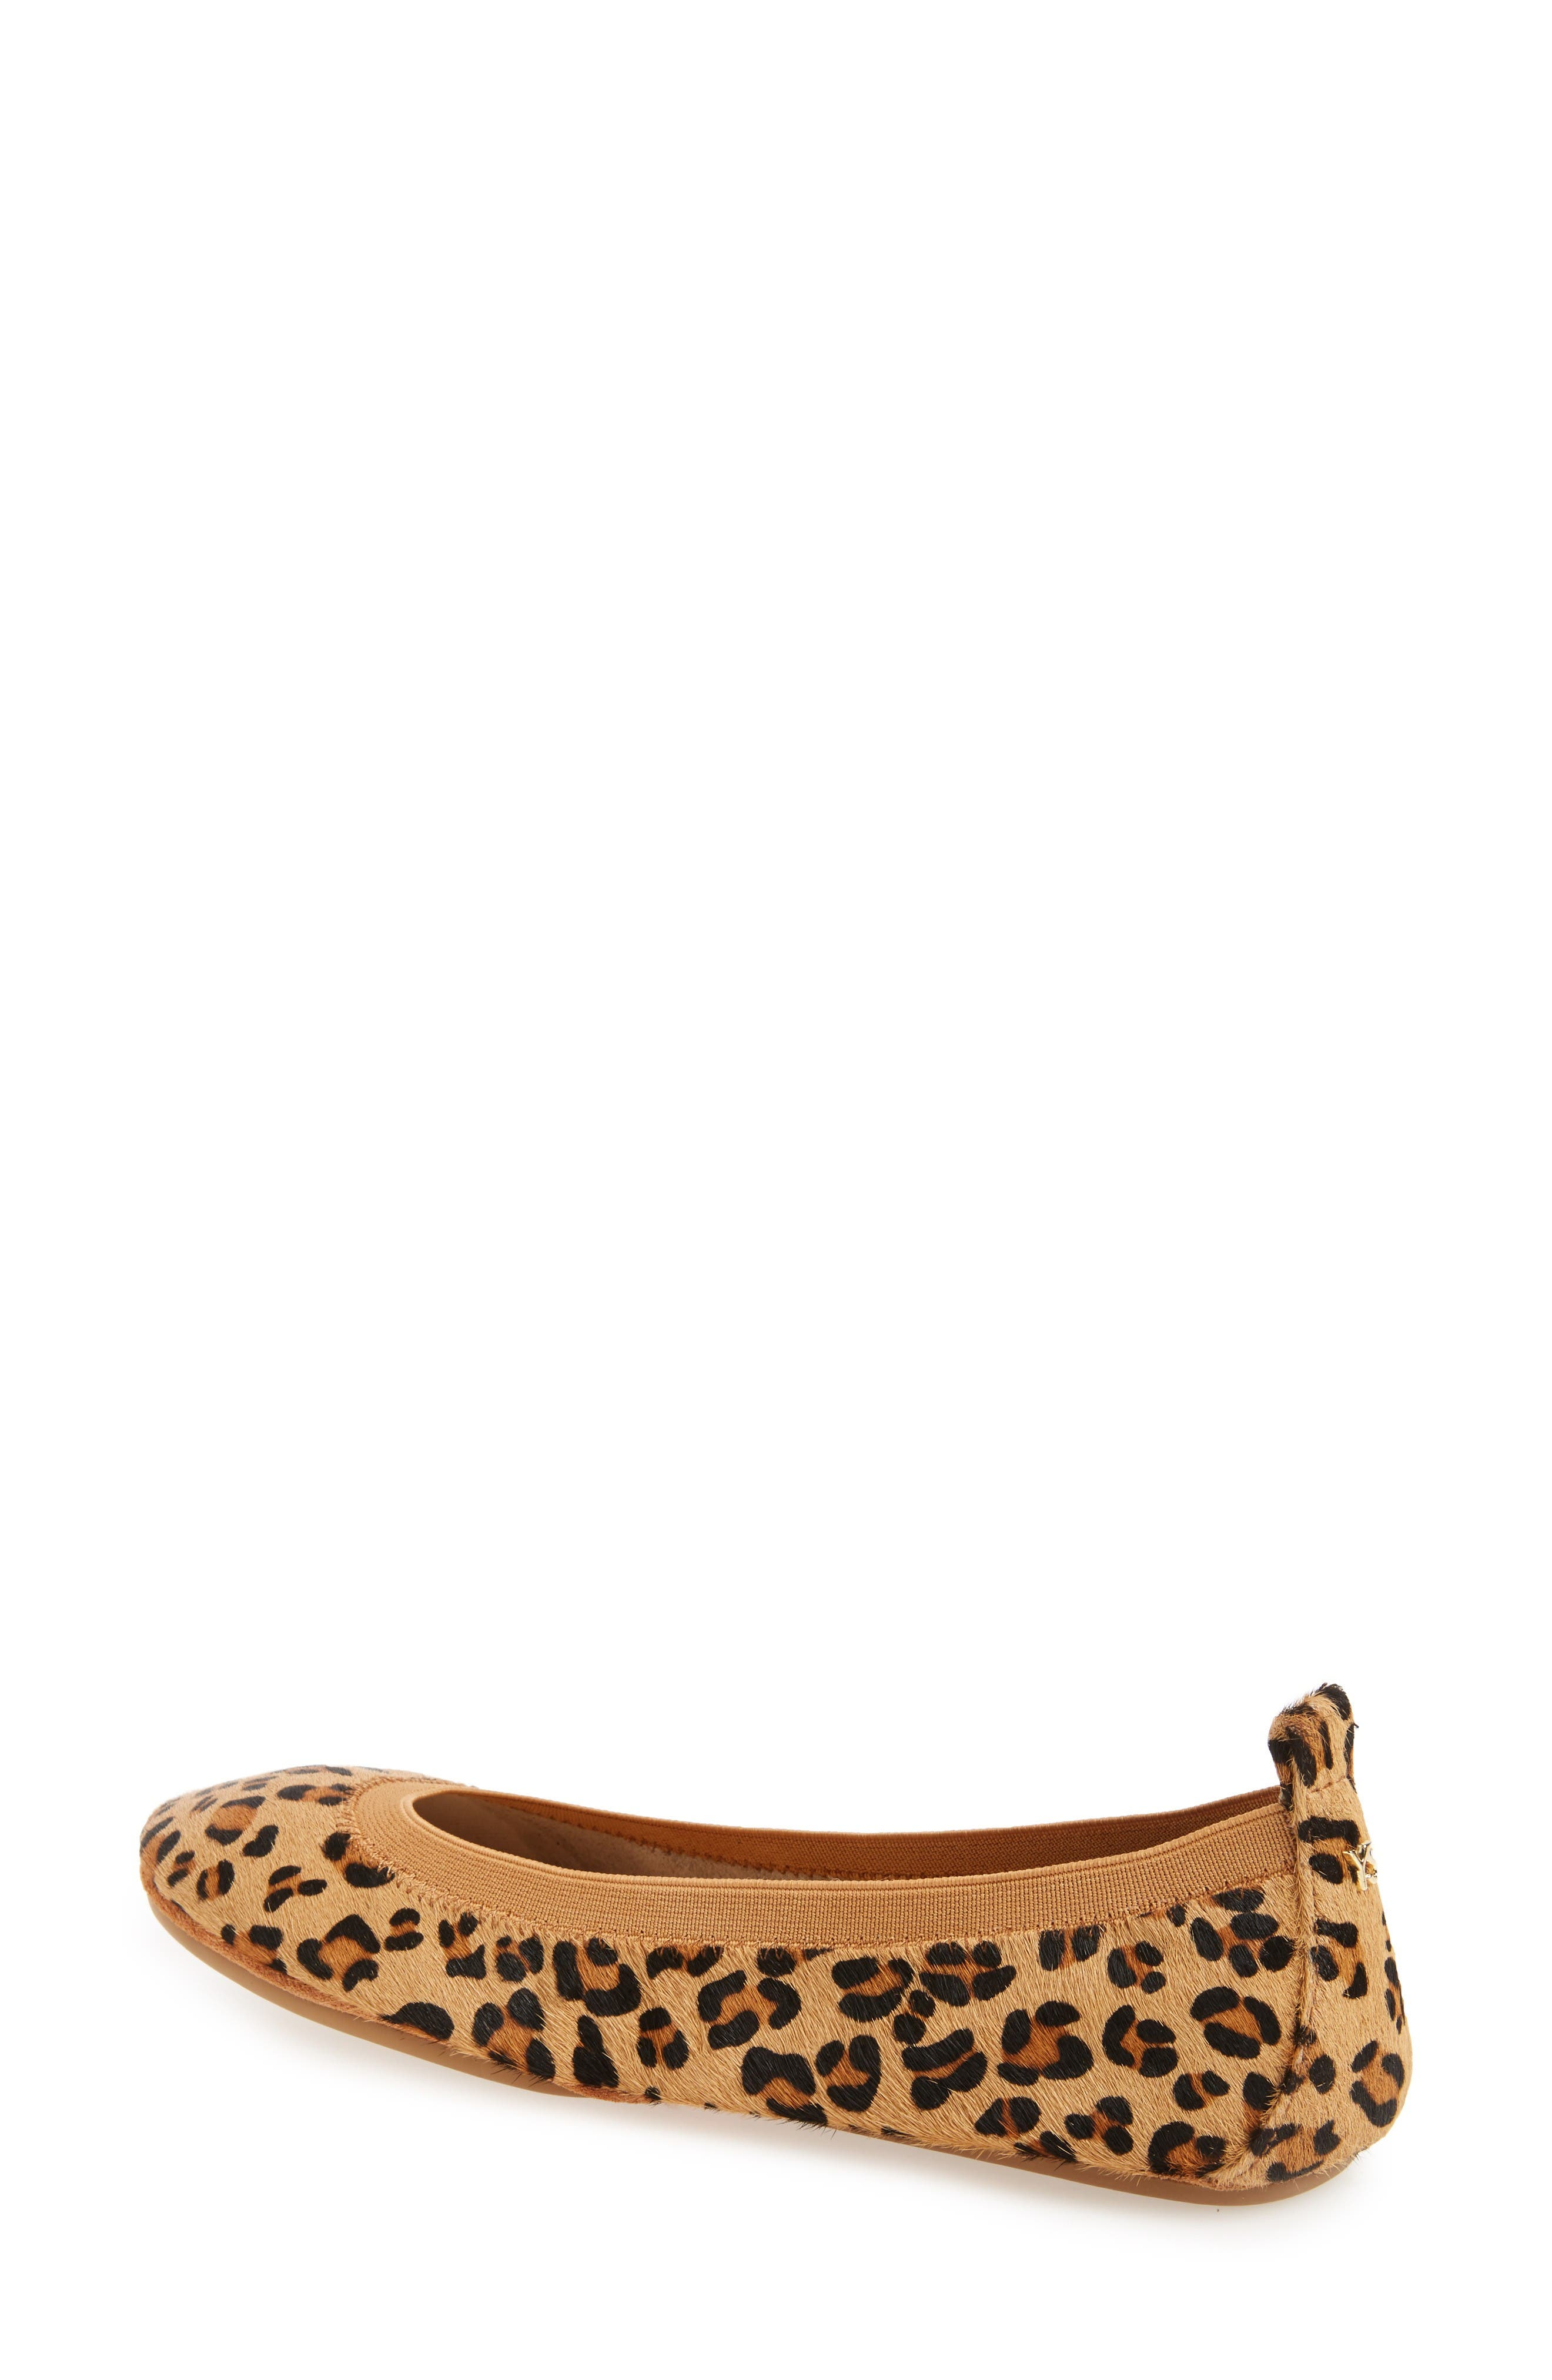 Samara 2.0 Foldable Ballet Flat,                             Alternate thumbnail 2, color,                             Natural Leopard Calf Hair